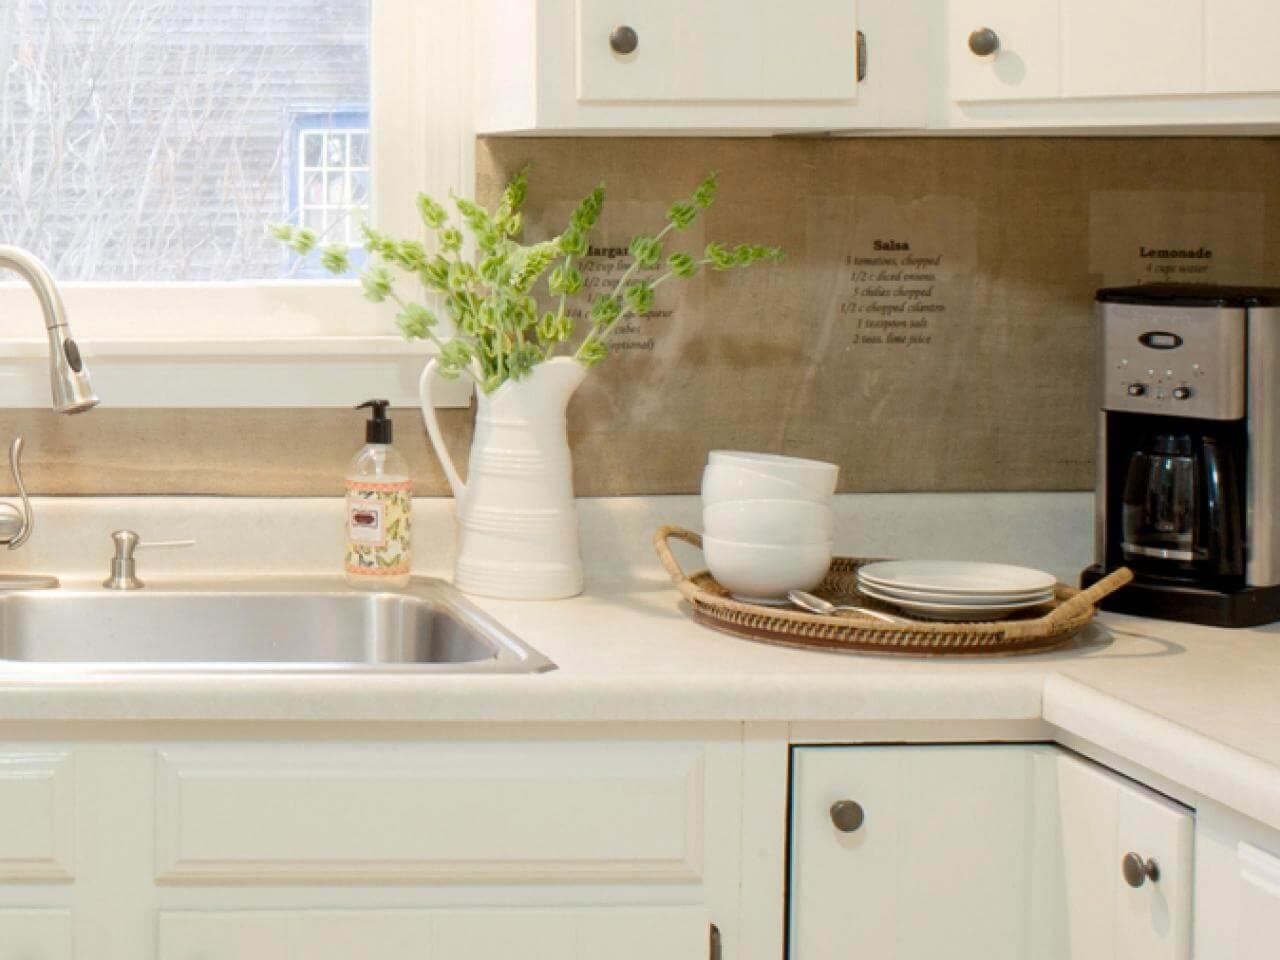 Inexpensive, cool kitchen splashback